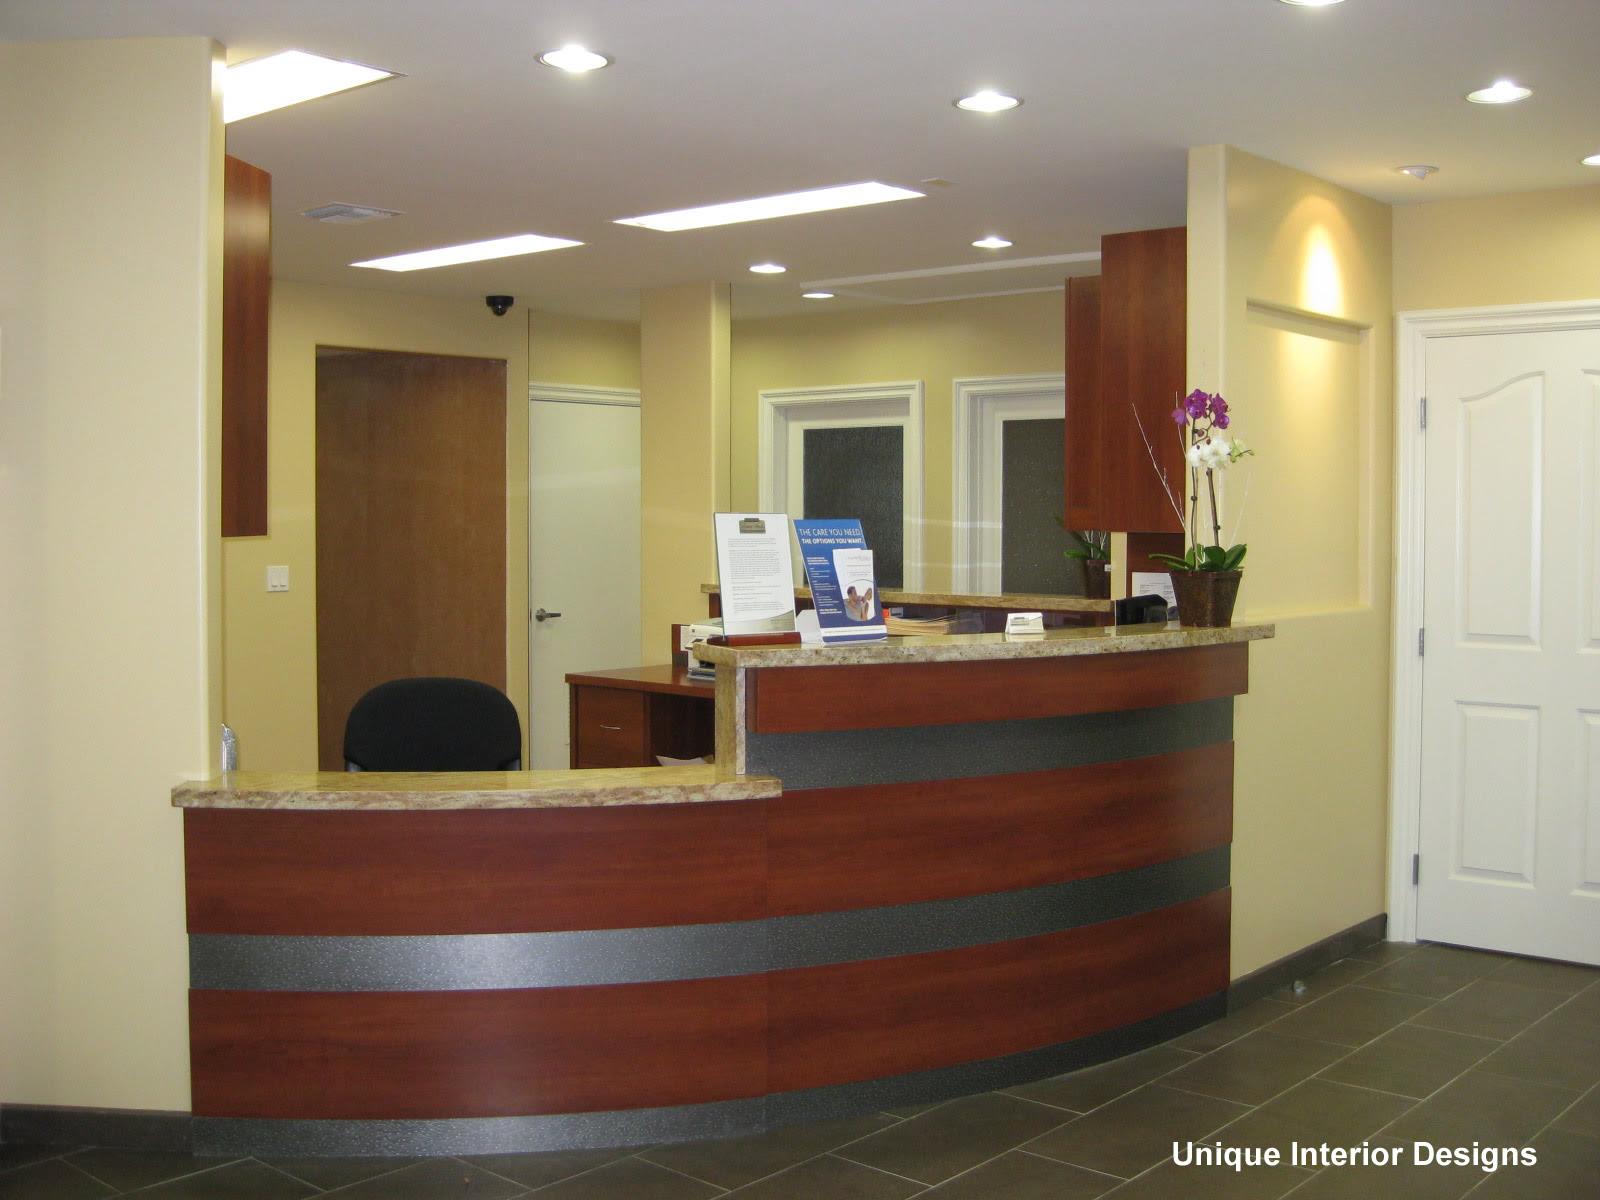 Dental Office Showcase 1 Unique Interior Designs Dental Office